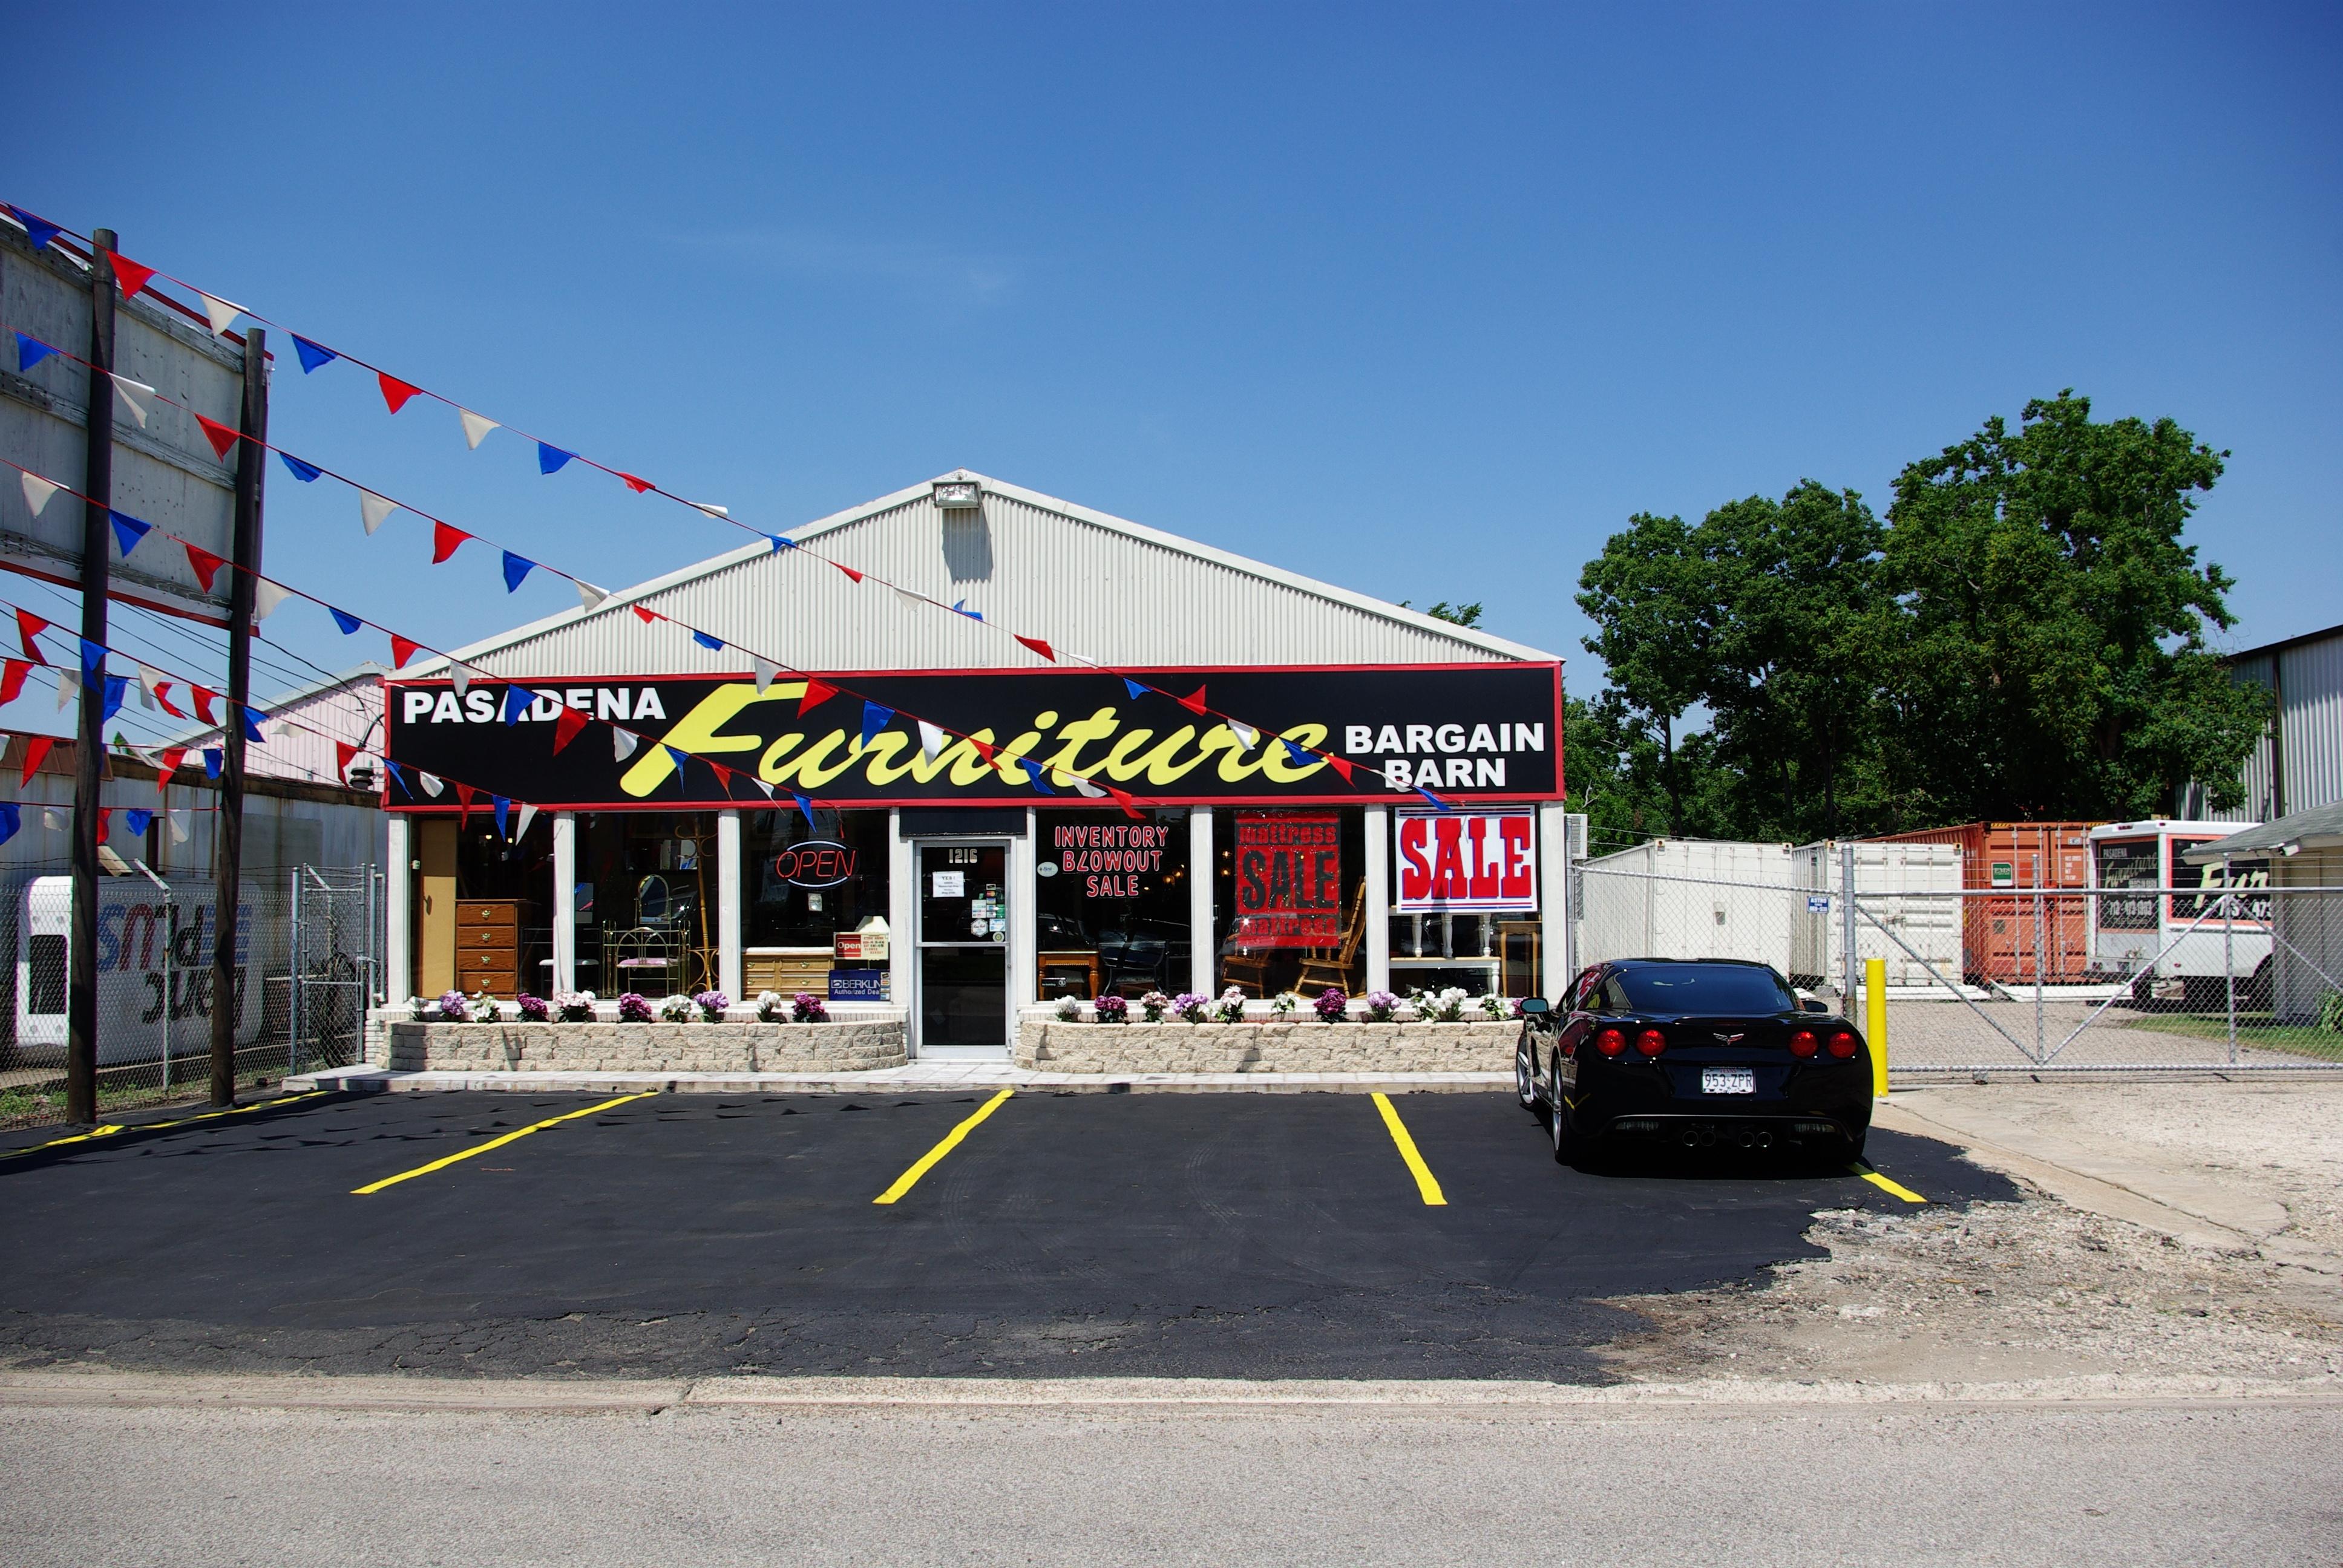 Pasadena Furniture Bargain Barn 1216 Center St Pasadena ...